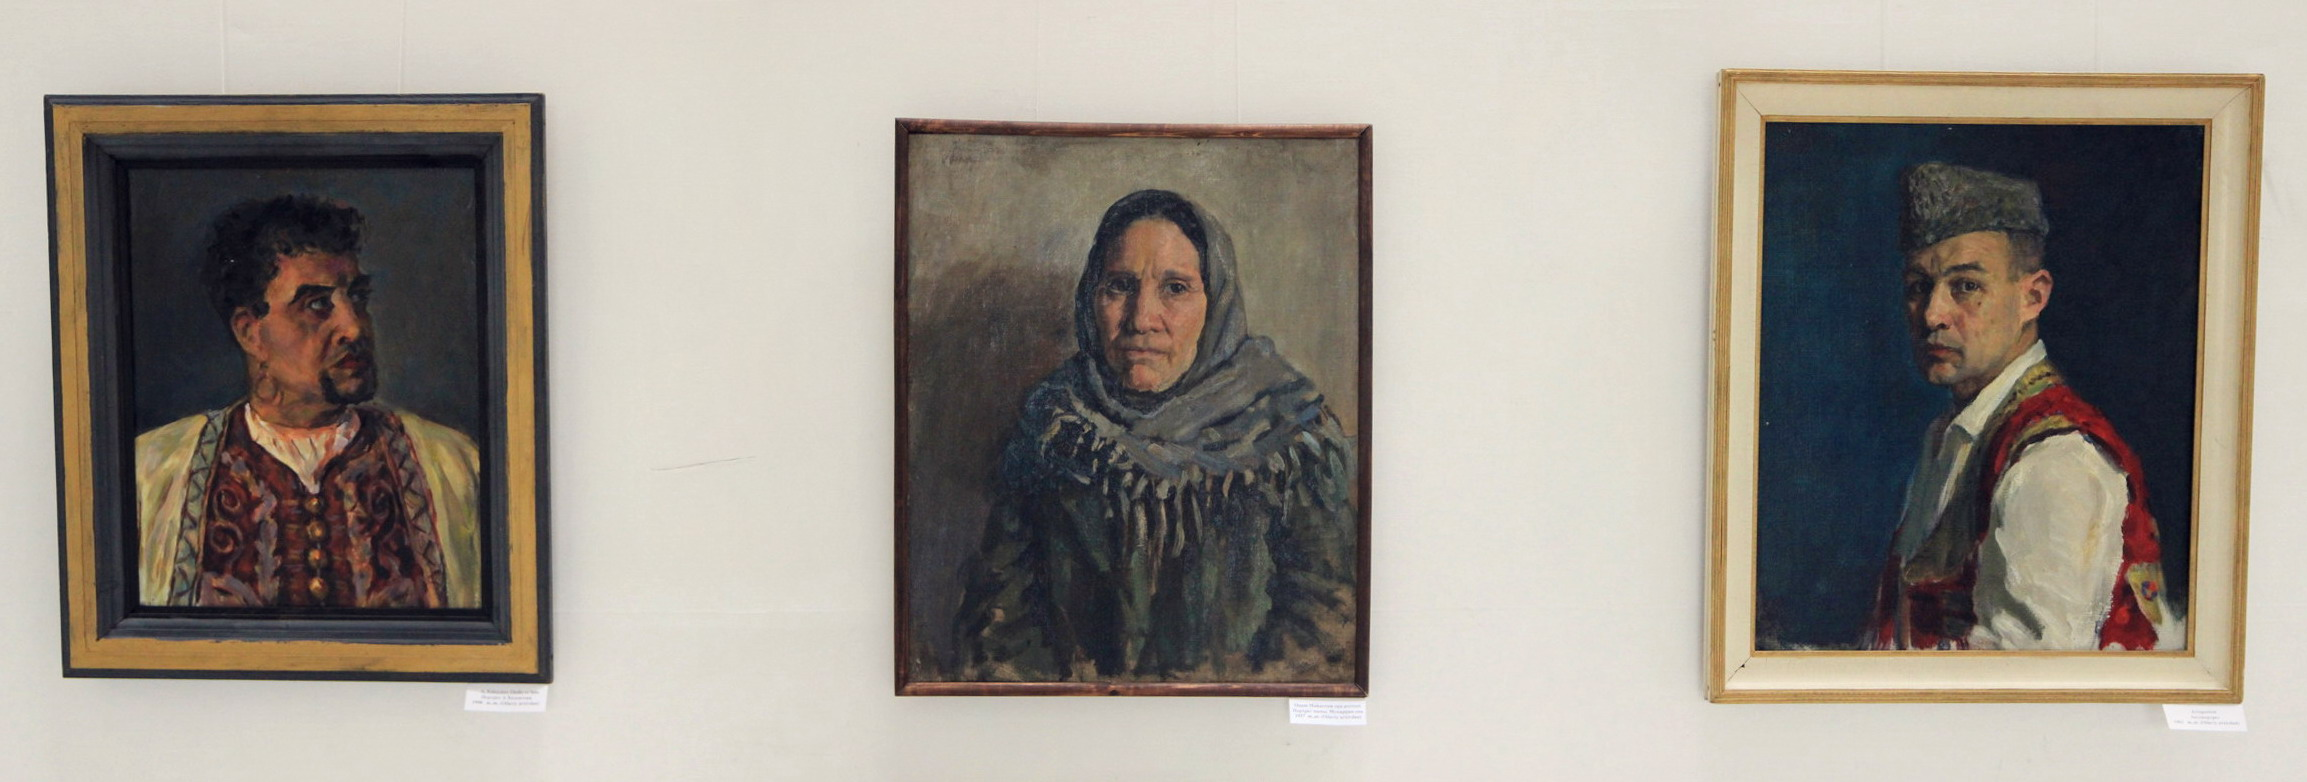 Абдулхак Абдуллаев. Портрет А. Хидоятова, Портрет мамы, Мукаррам опа, Автопортрет (Семейный архив)